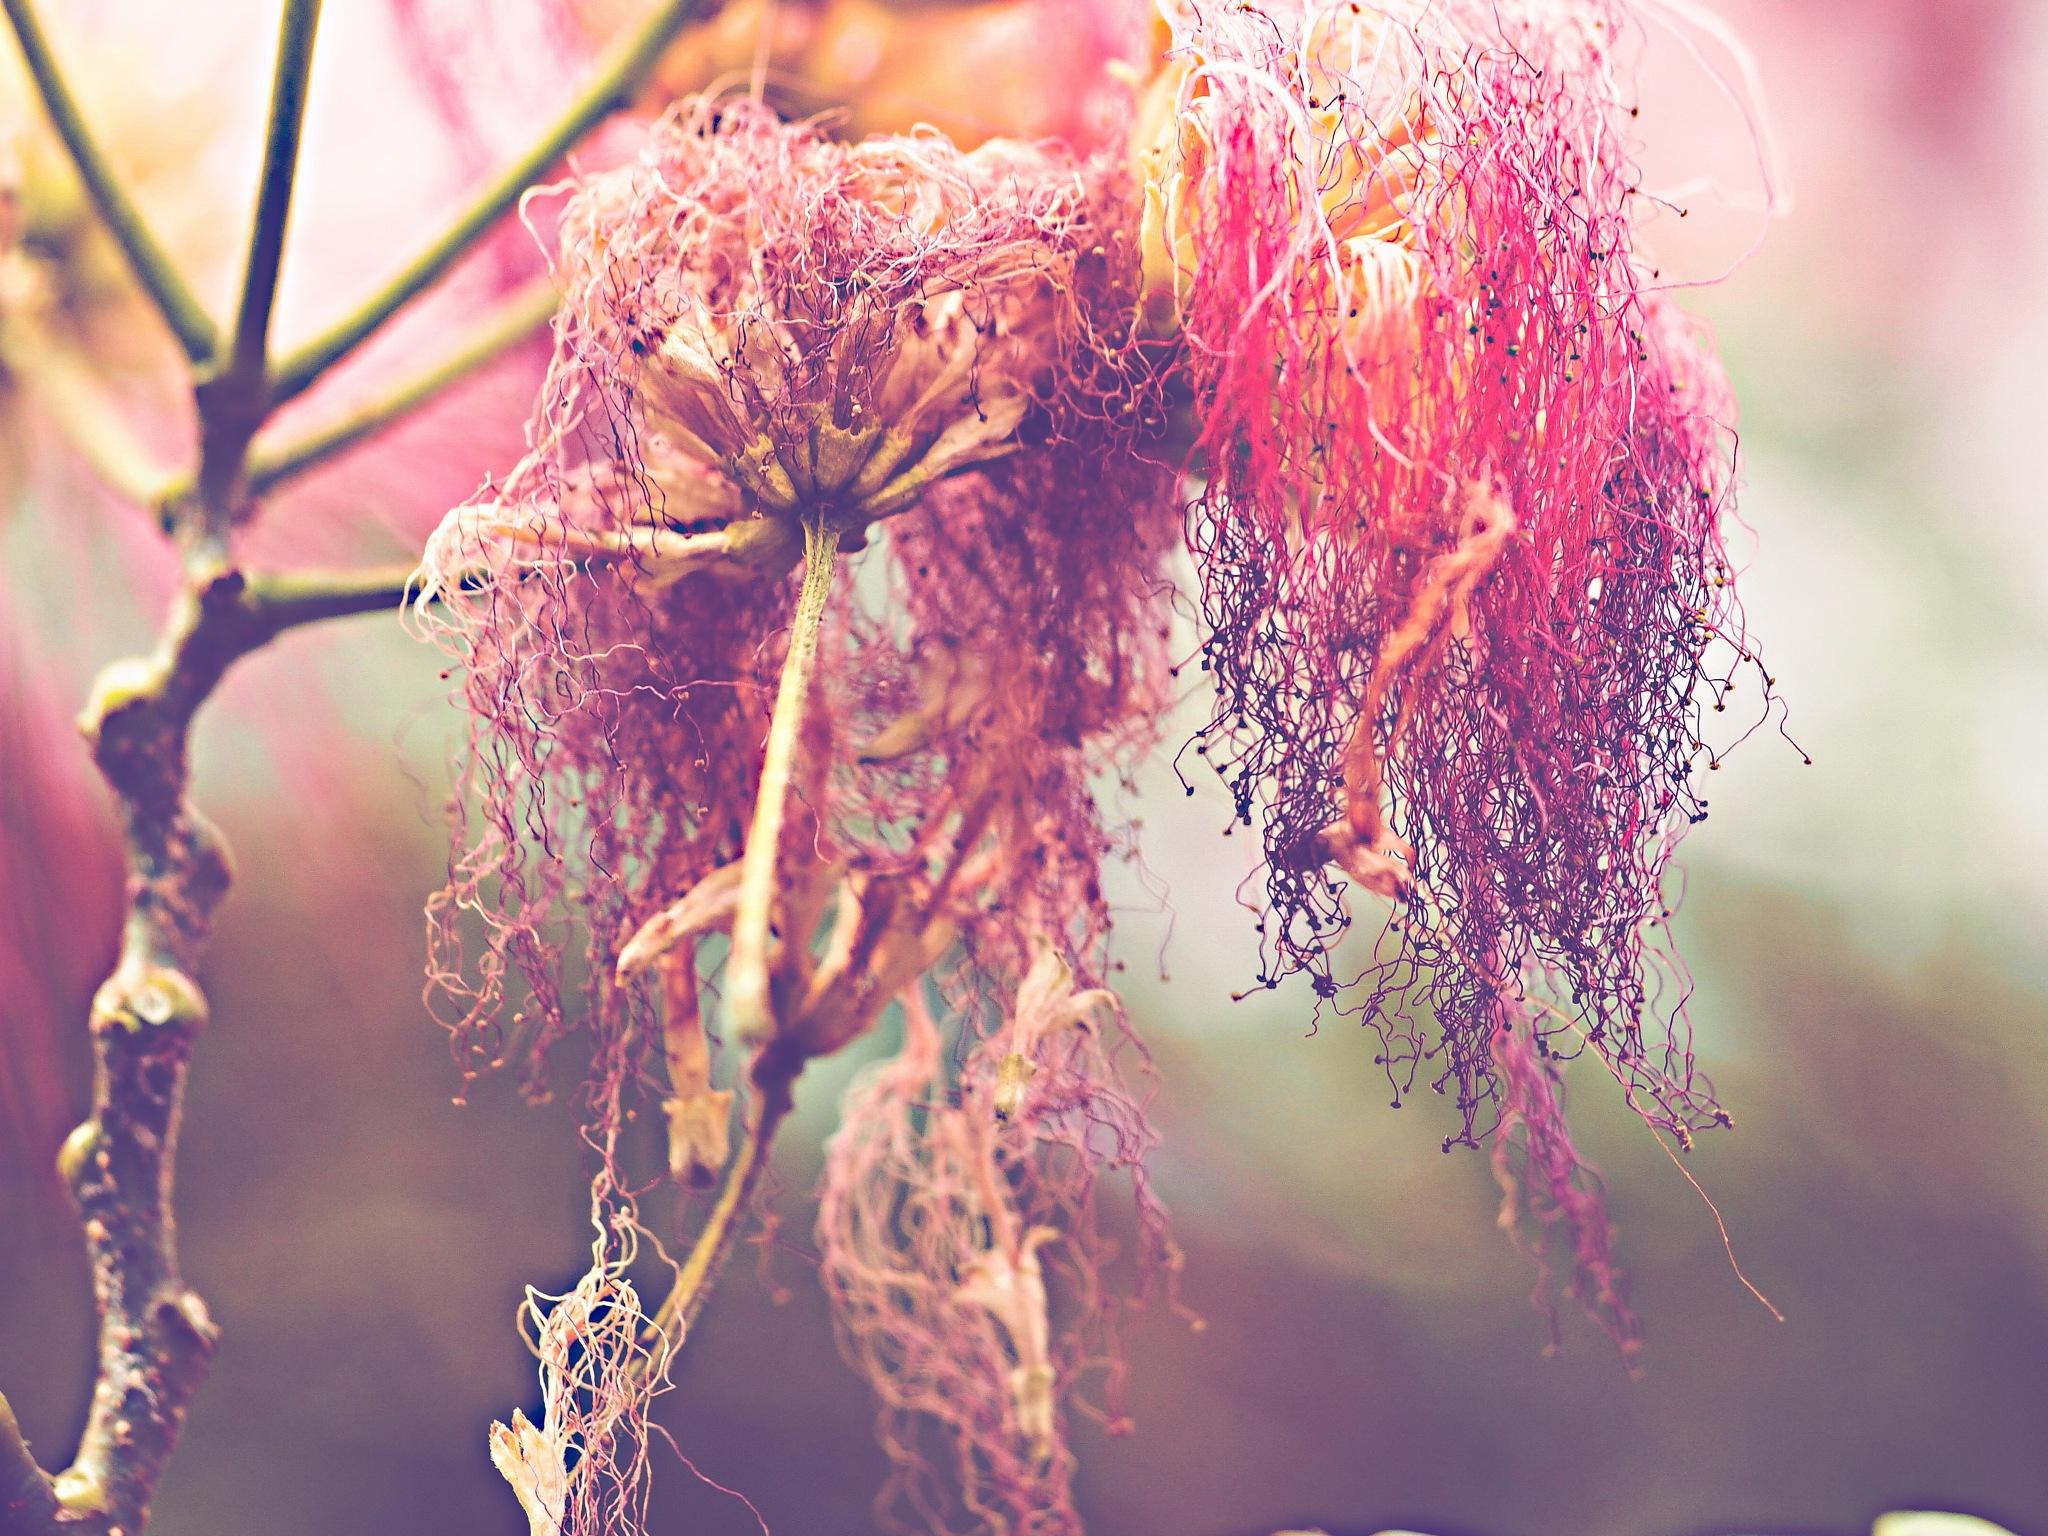 acacia flowers by alain michel